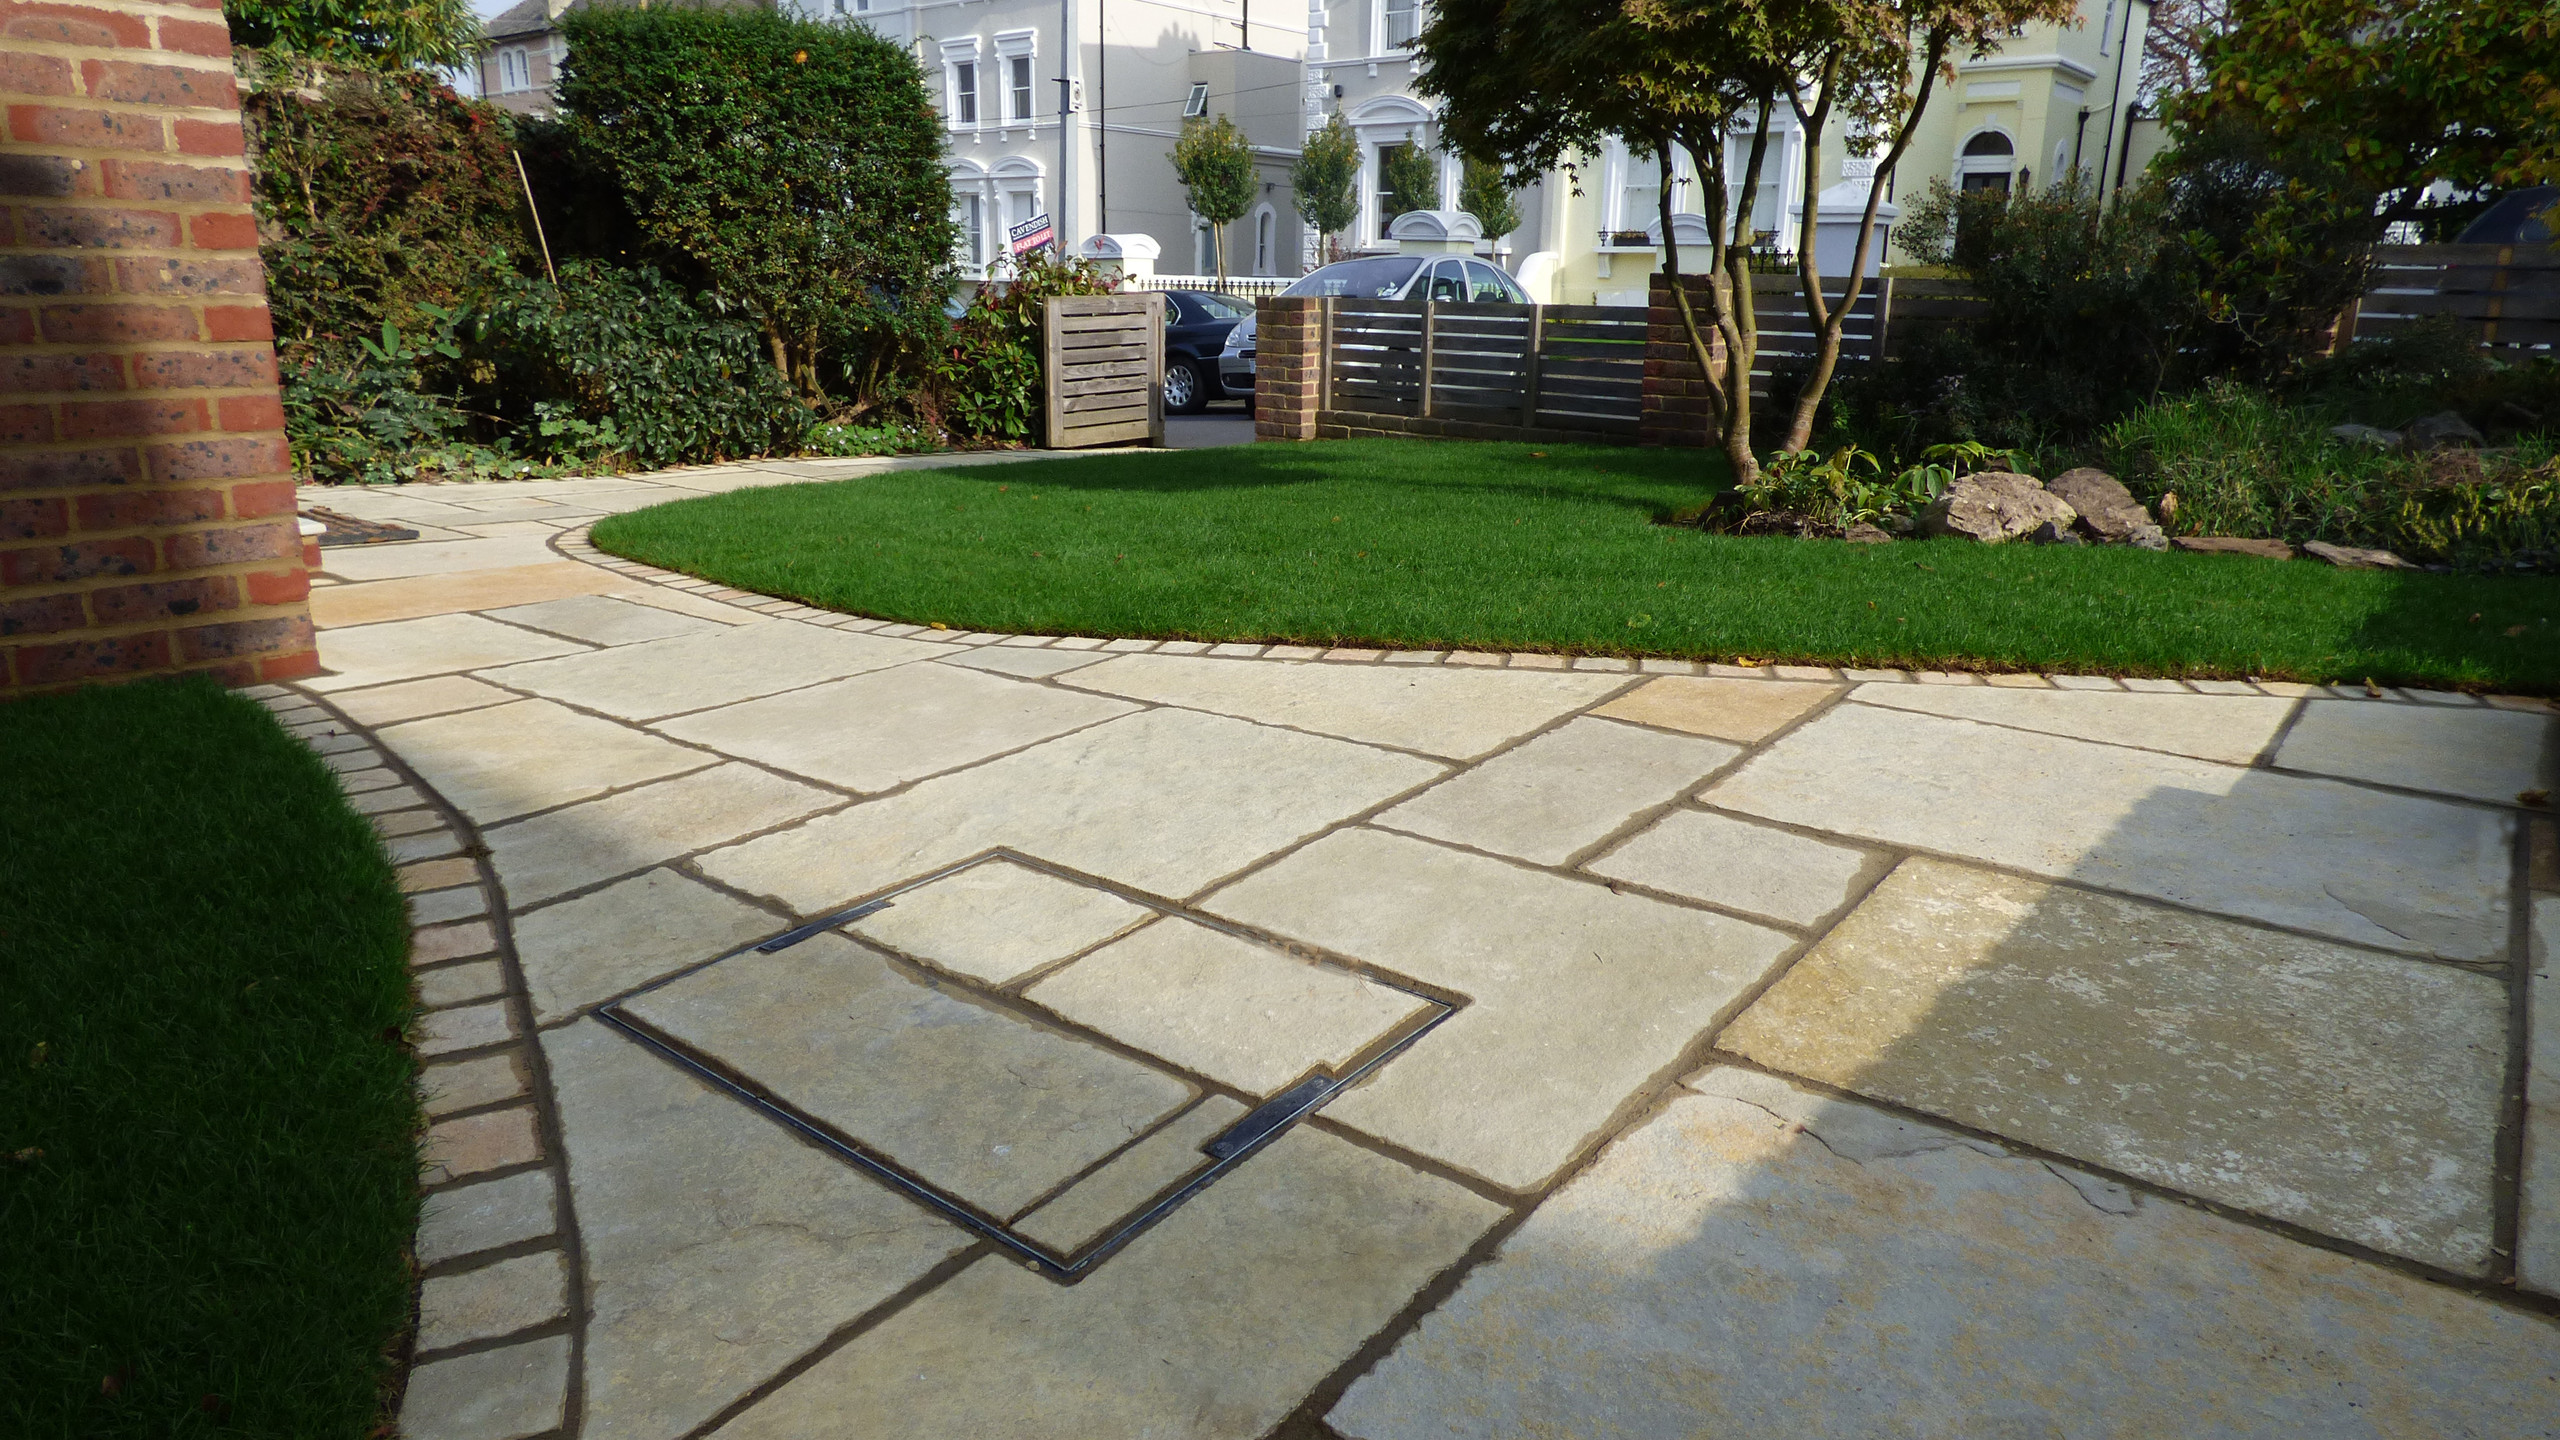 Re-landscaped front garden in Sevenoaks